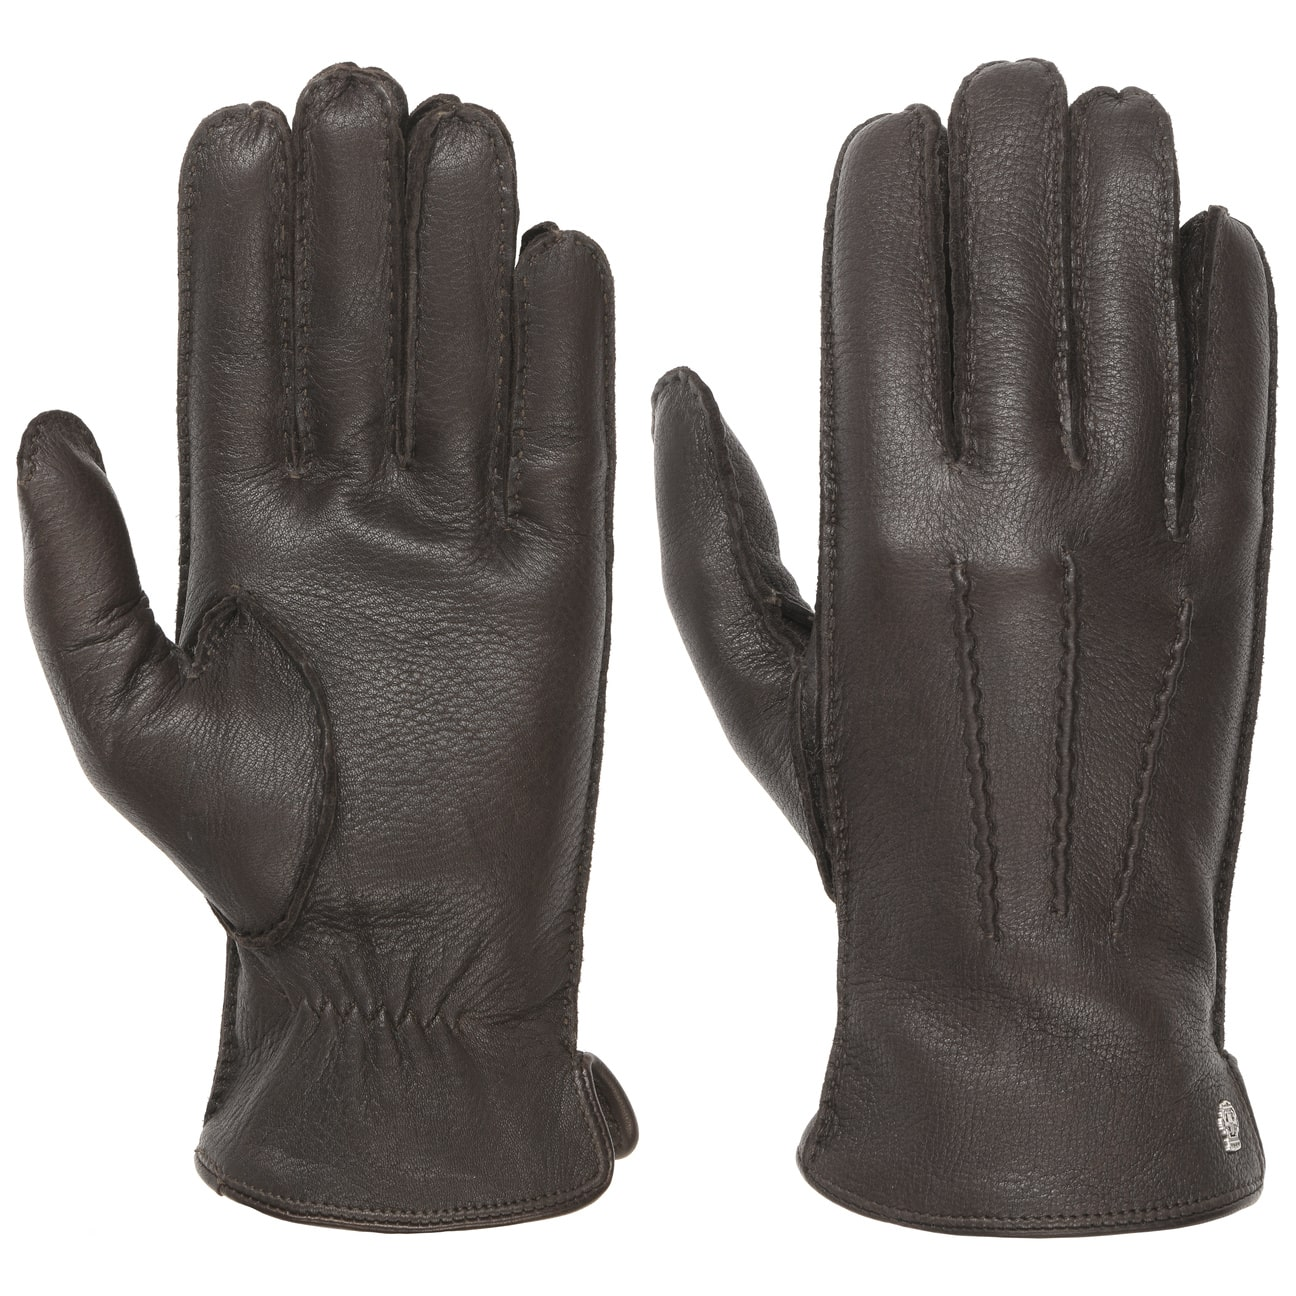 Gants pour Homme Sting by Roeckl  gants avec dogits